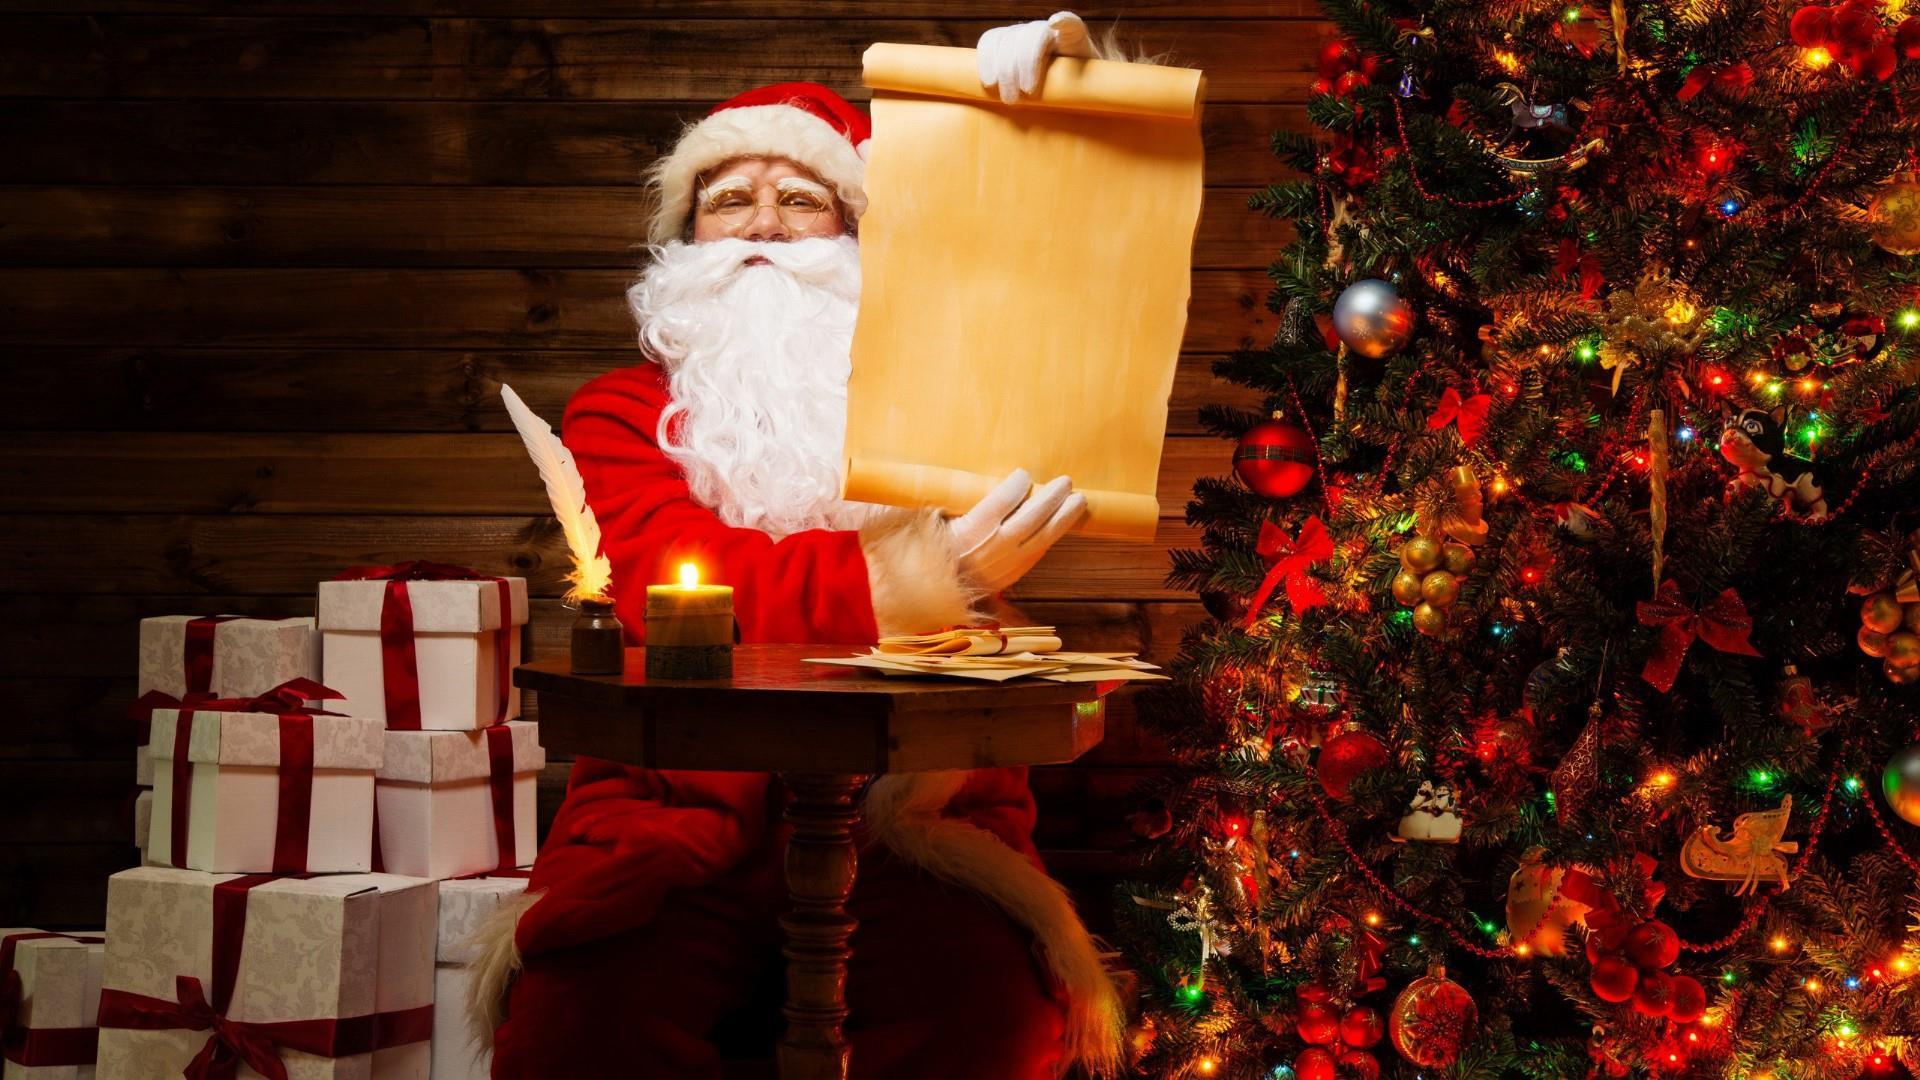 Santa Claus beside the Christmas tree wallpaper